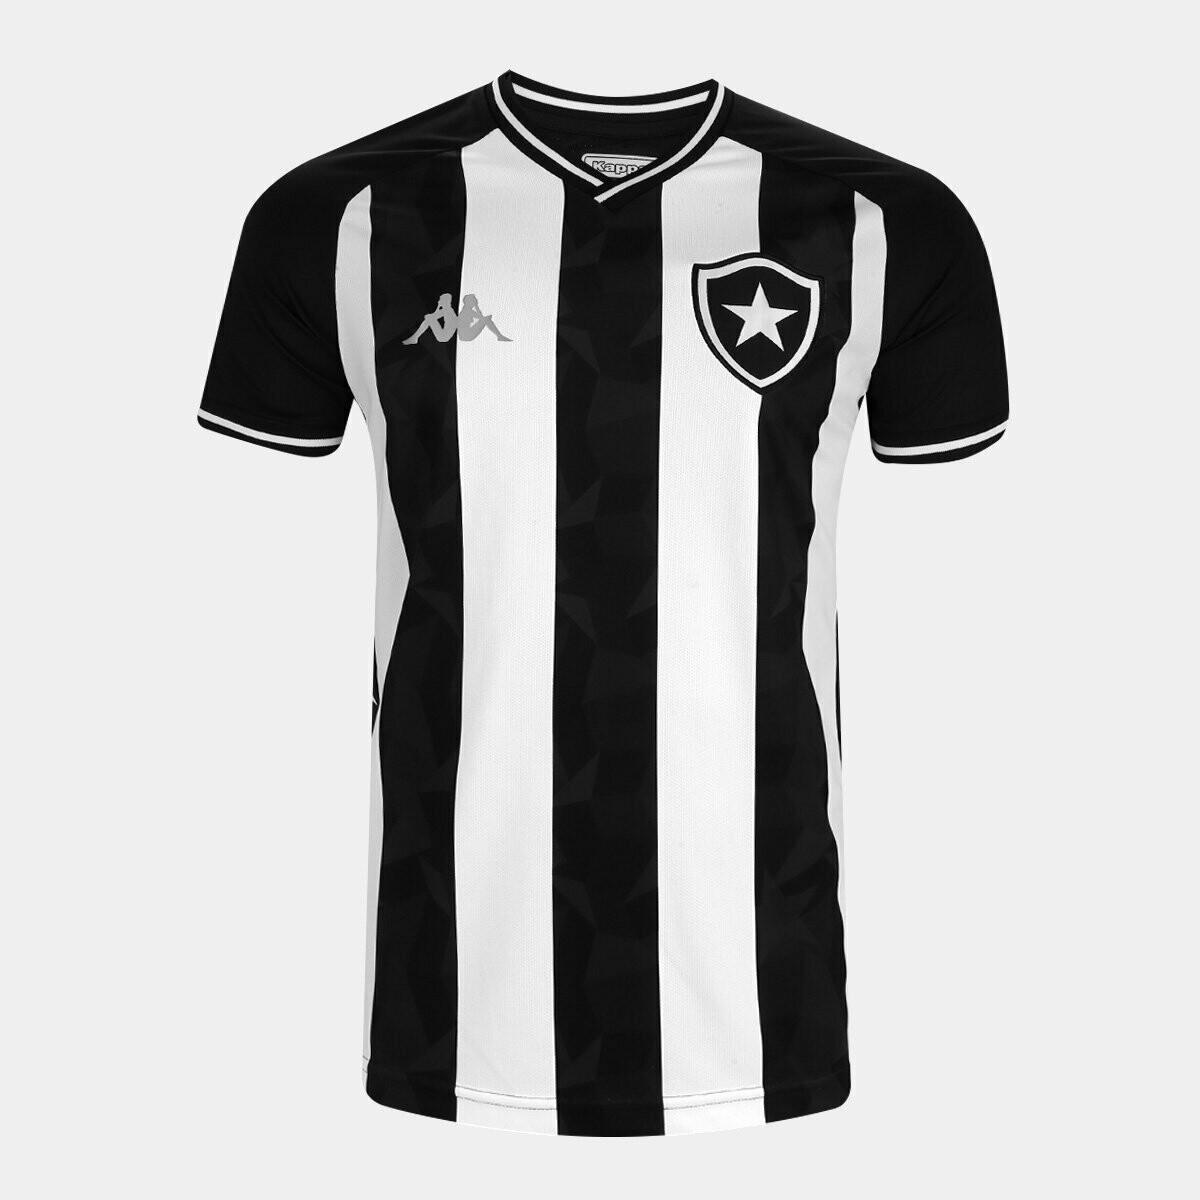 Camisa Botafogo I 19/20  Torcedor Kappa Masculina - Preto e Branco